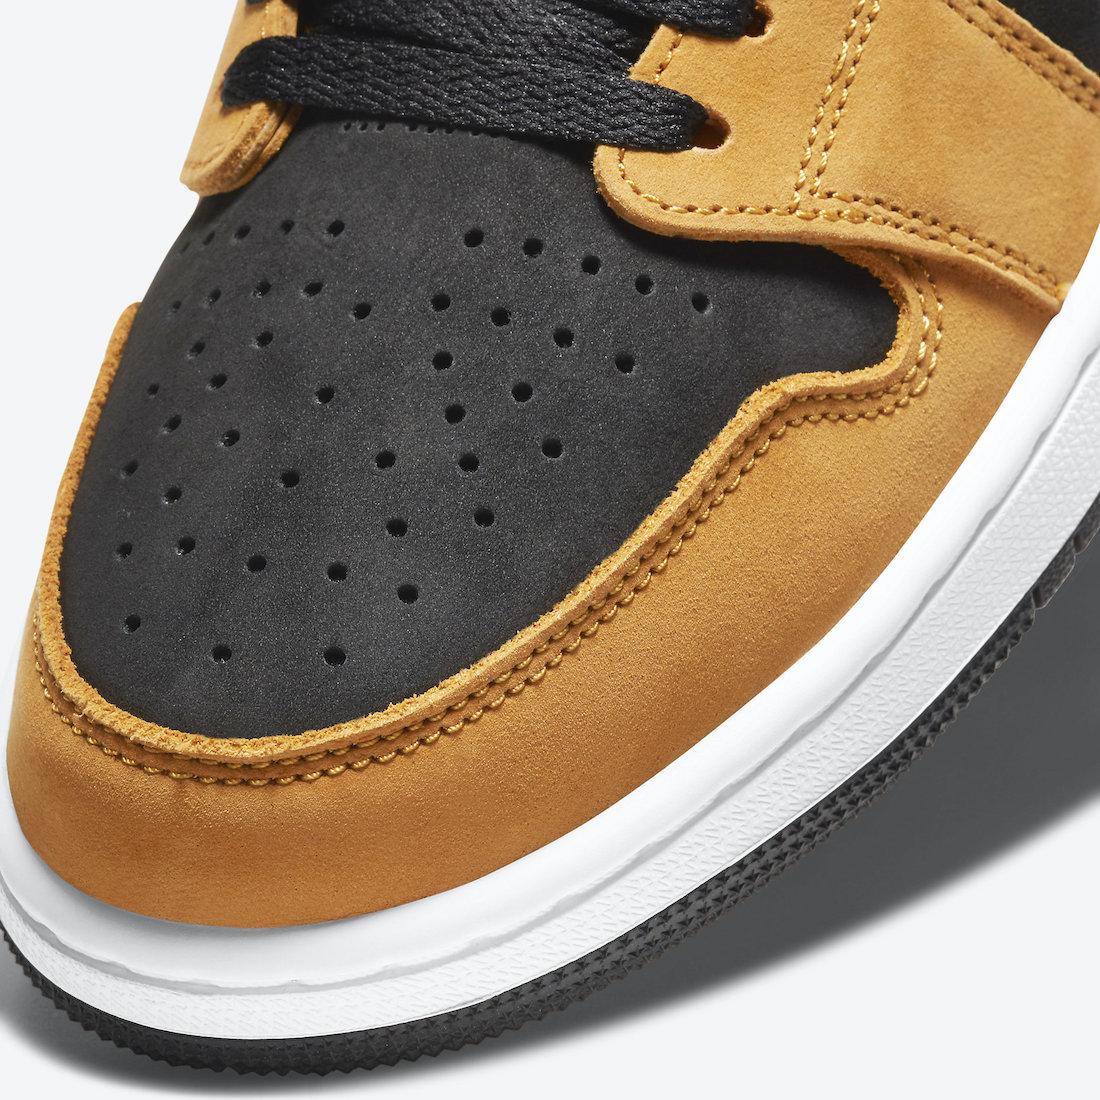 Air Jordan 1 Zoom Comfort Black Wheat CT0978-002 Release Date Info